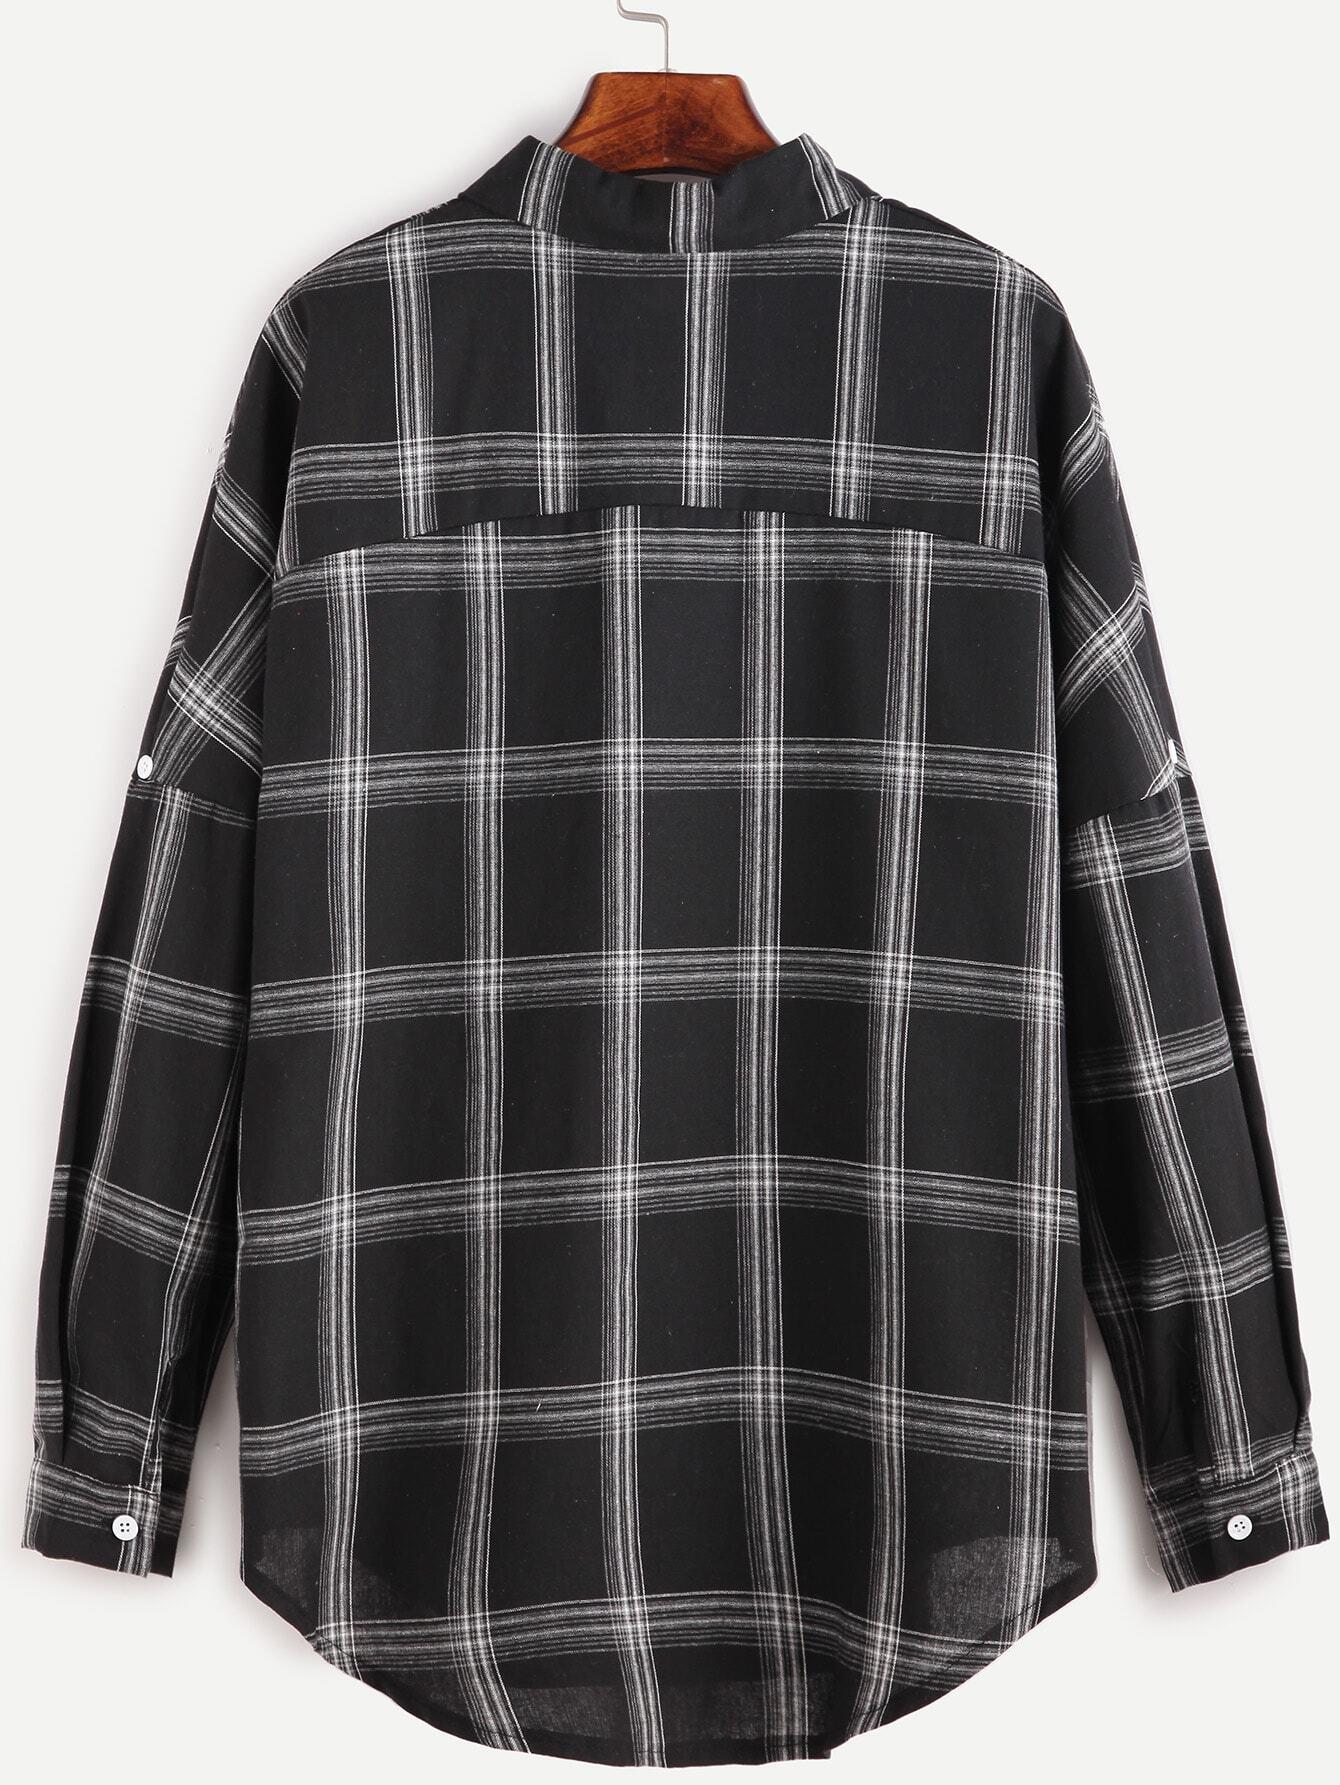 hemd mit taschen drop schulter vorne kurz hinten lang schwarz german romwe. Black Bedroom Furniture Sets. Home Design Ideas